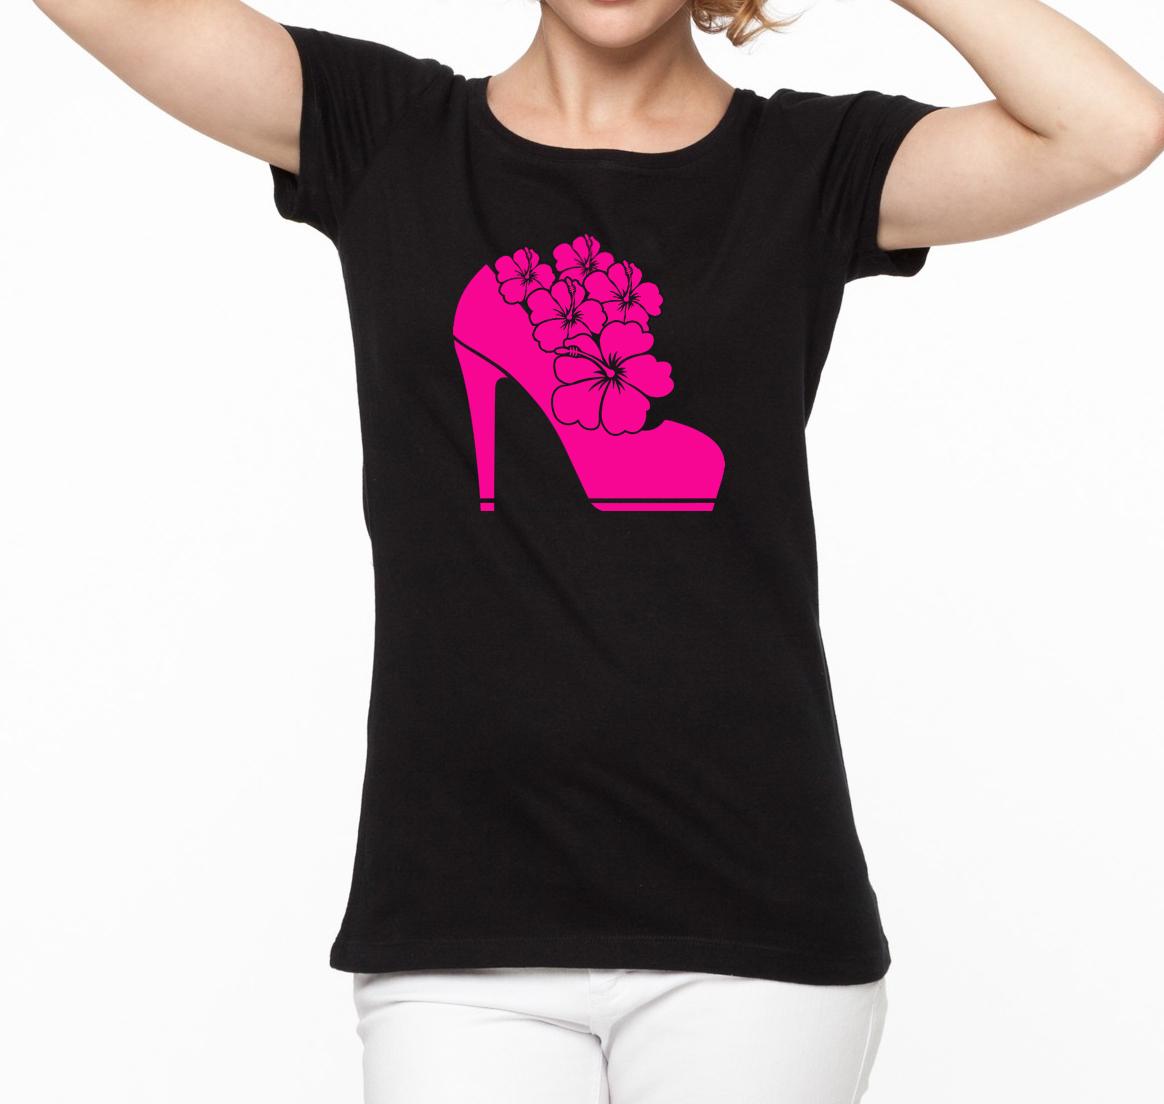 shoe example.jpg